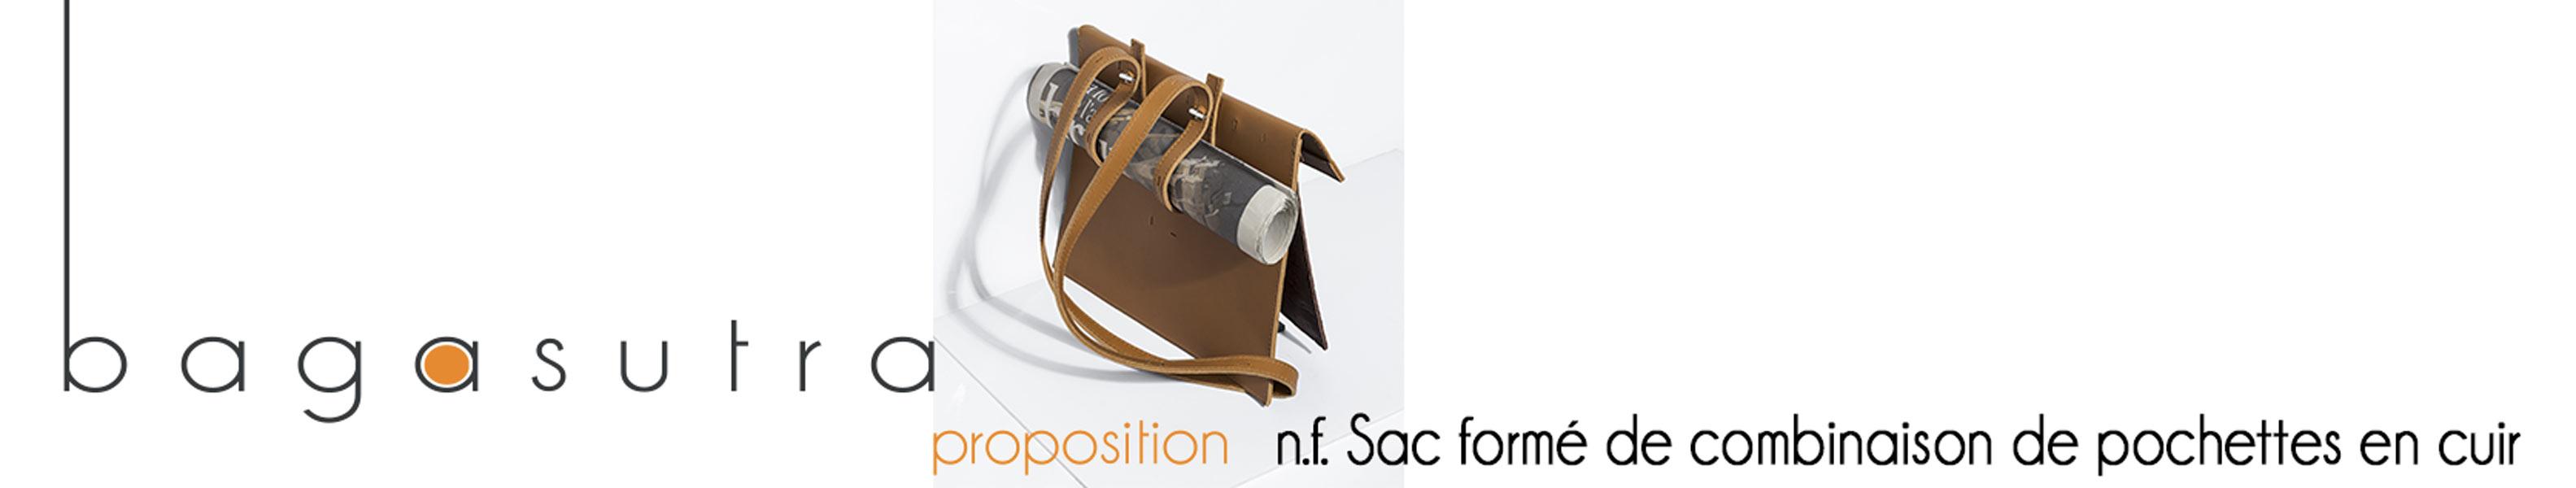 ABC-proposition3 BAGaSUTRA